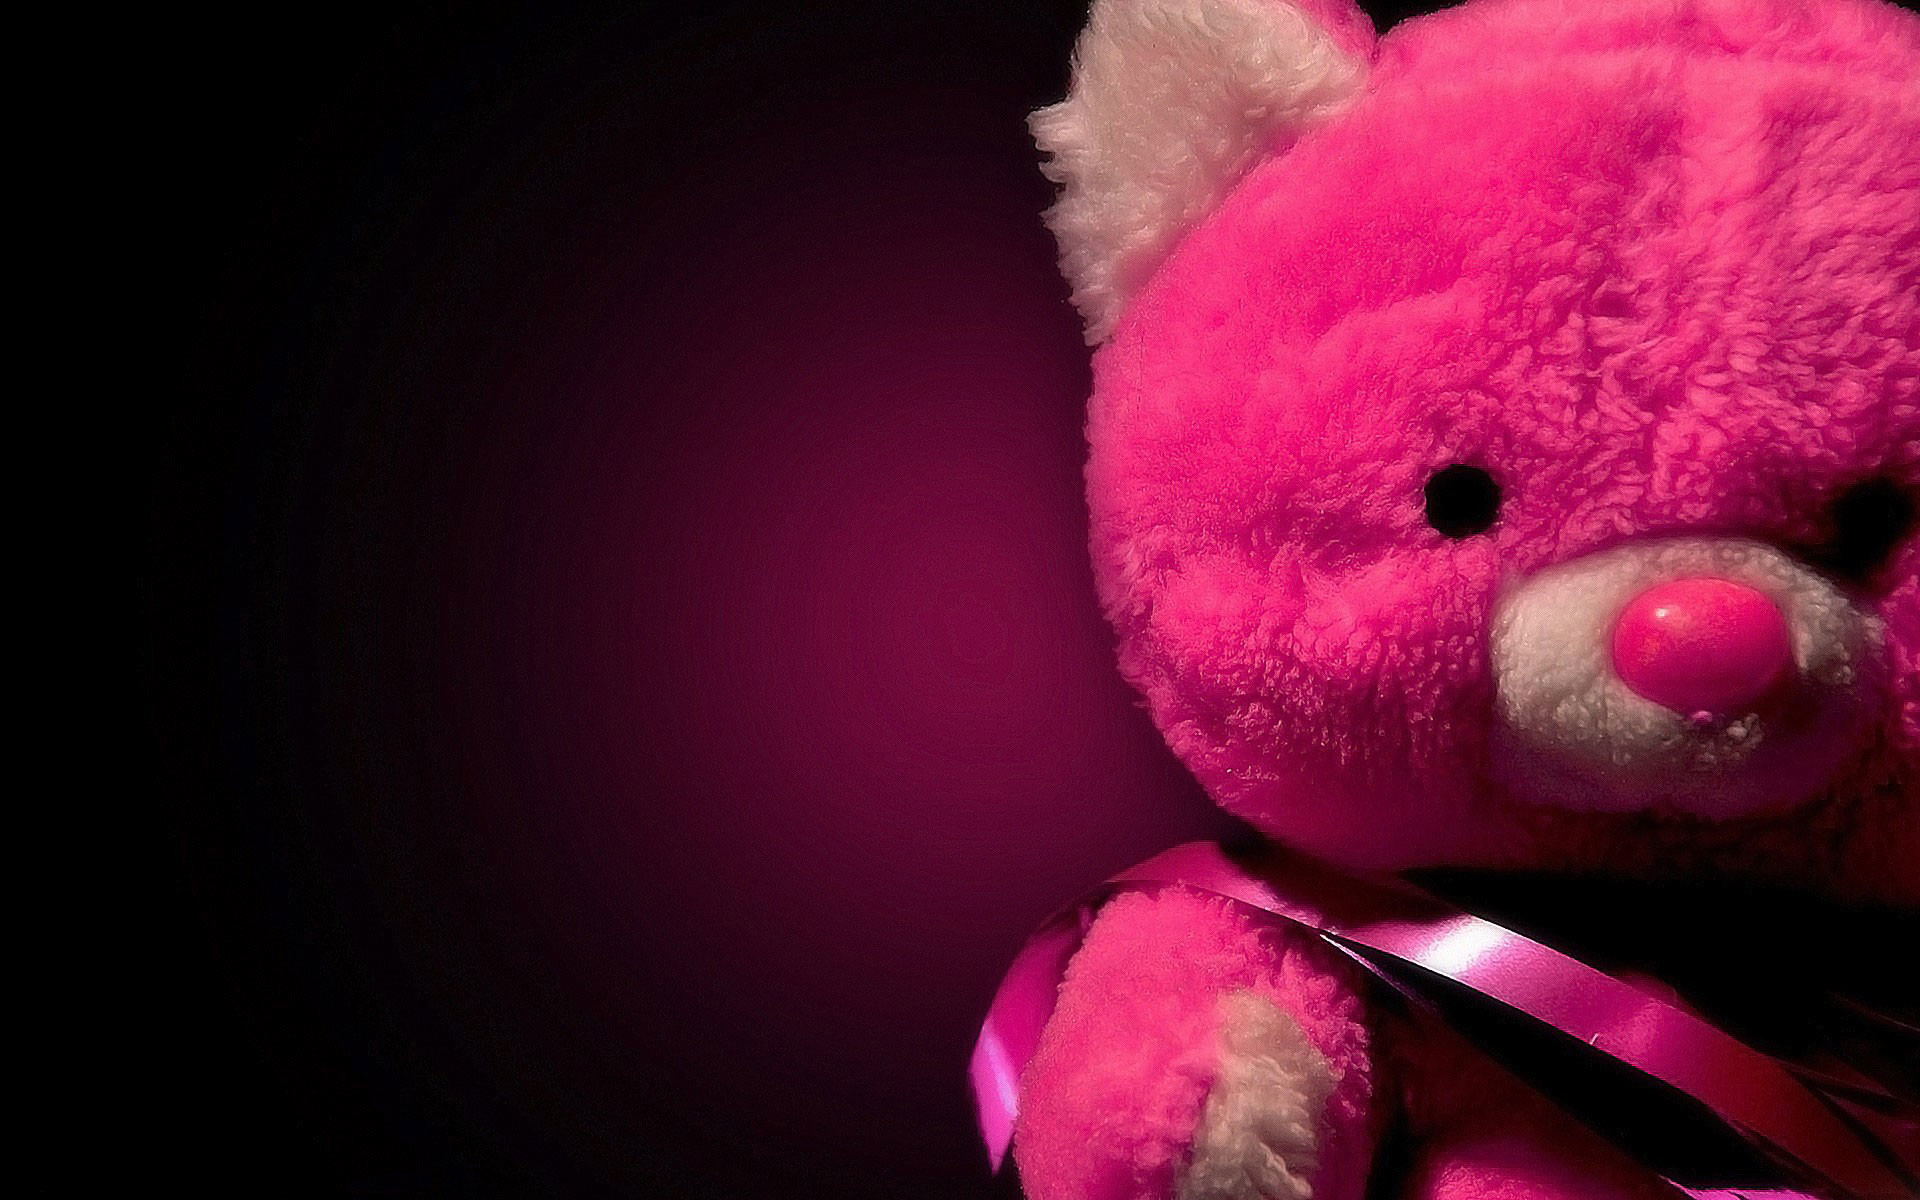 Res: 1920x1200, Cute Pink Teddy Bear Wallpaper HD Desktop Wallpaper, Background Image